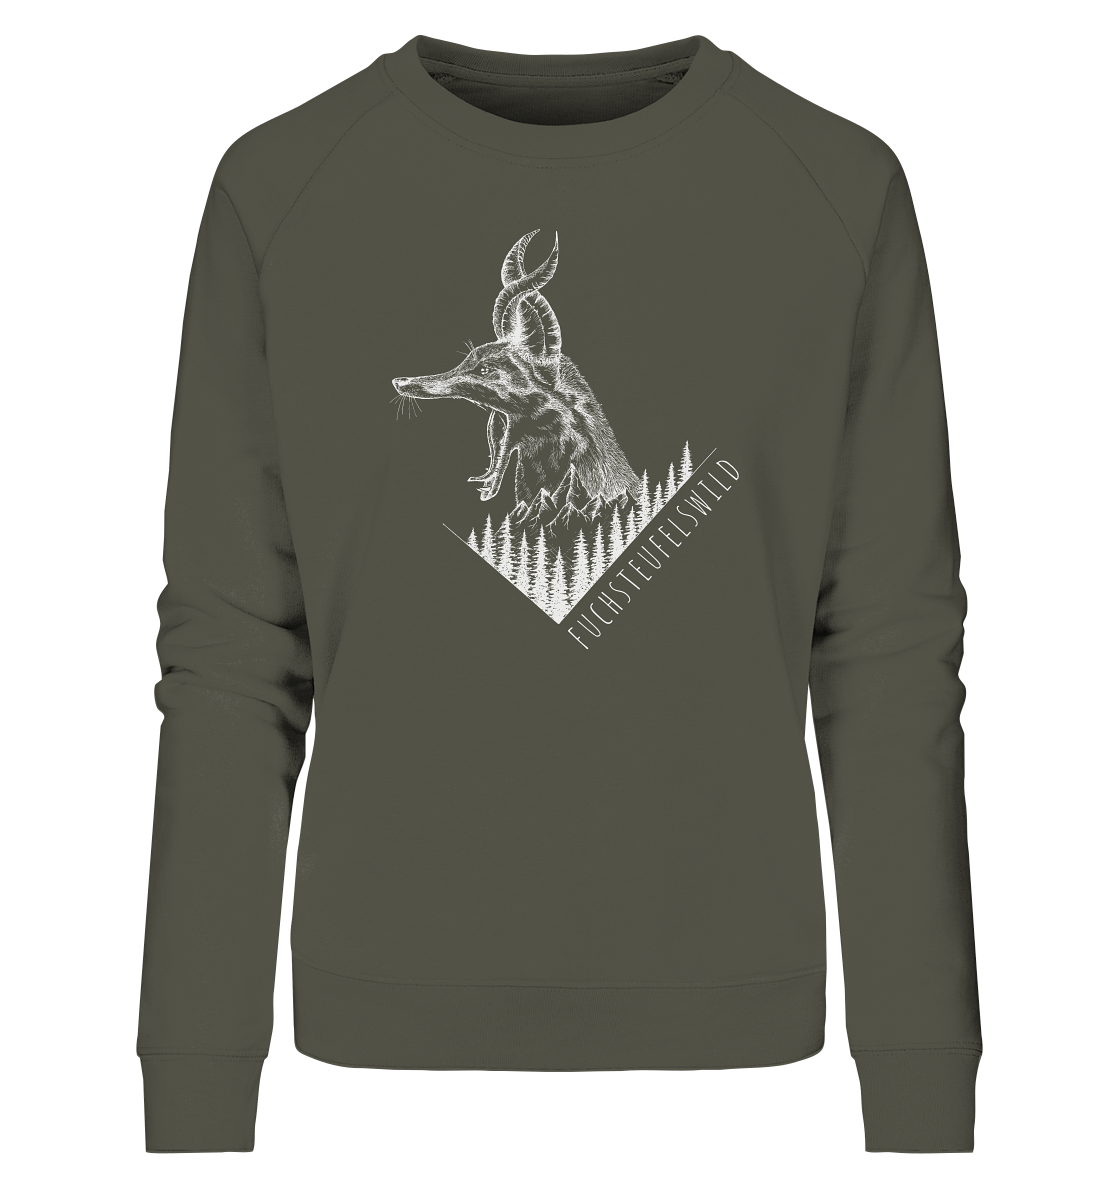 front-ladies-organic-sweatshirt-545348-1116x-3.png